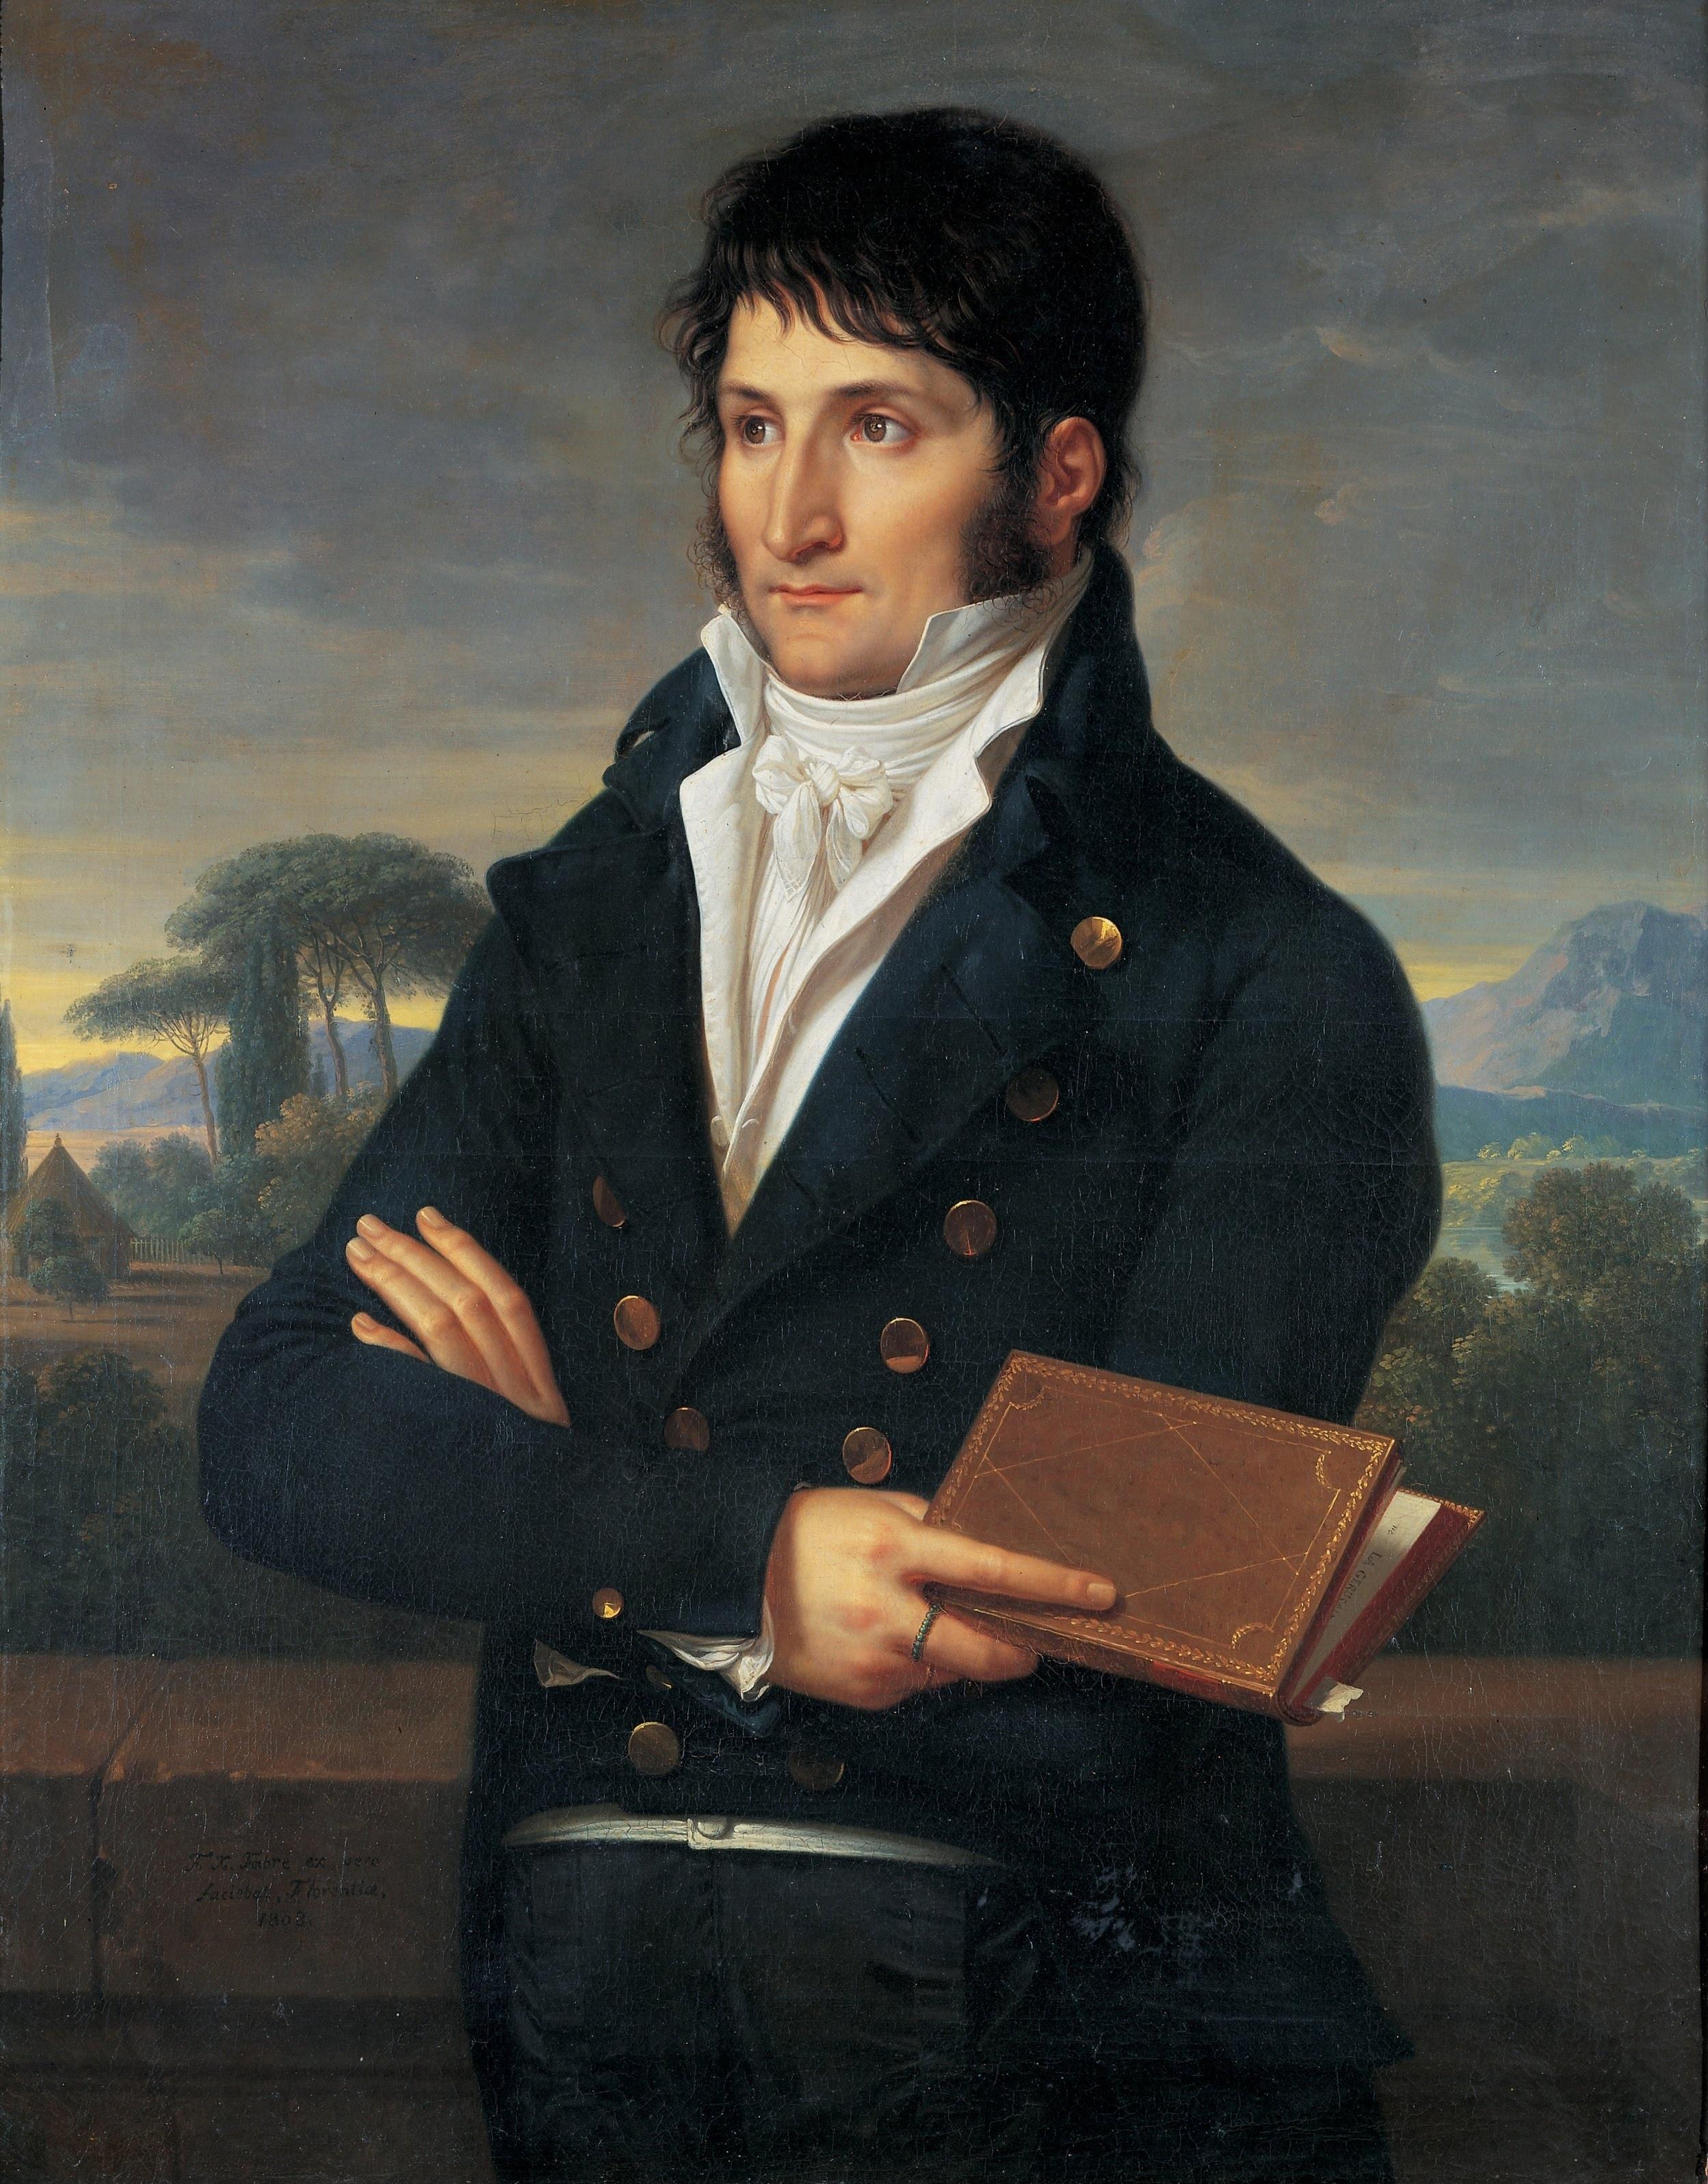 Lucien Bonaparte Lucien Bonaparte Wikipedia the free encyclopedia